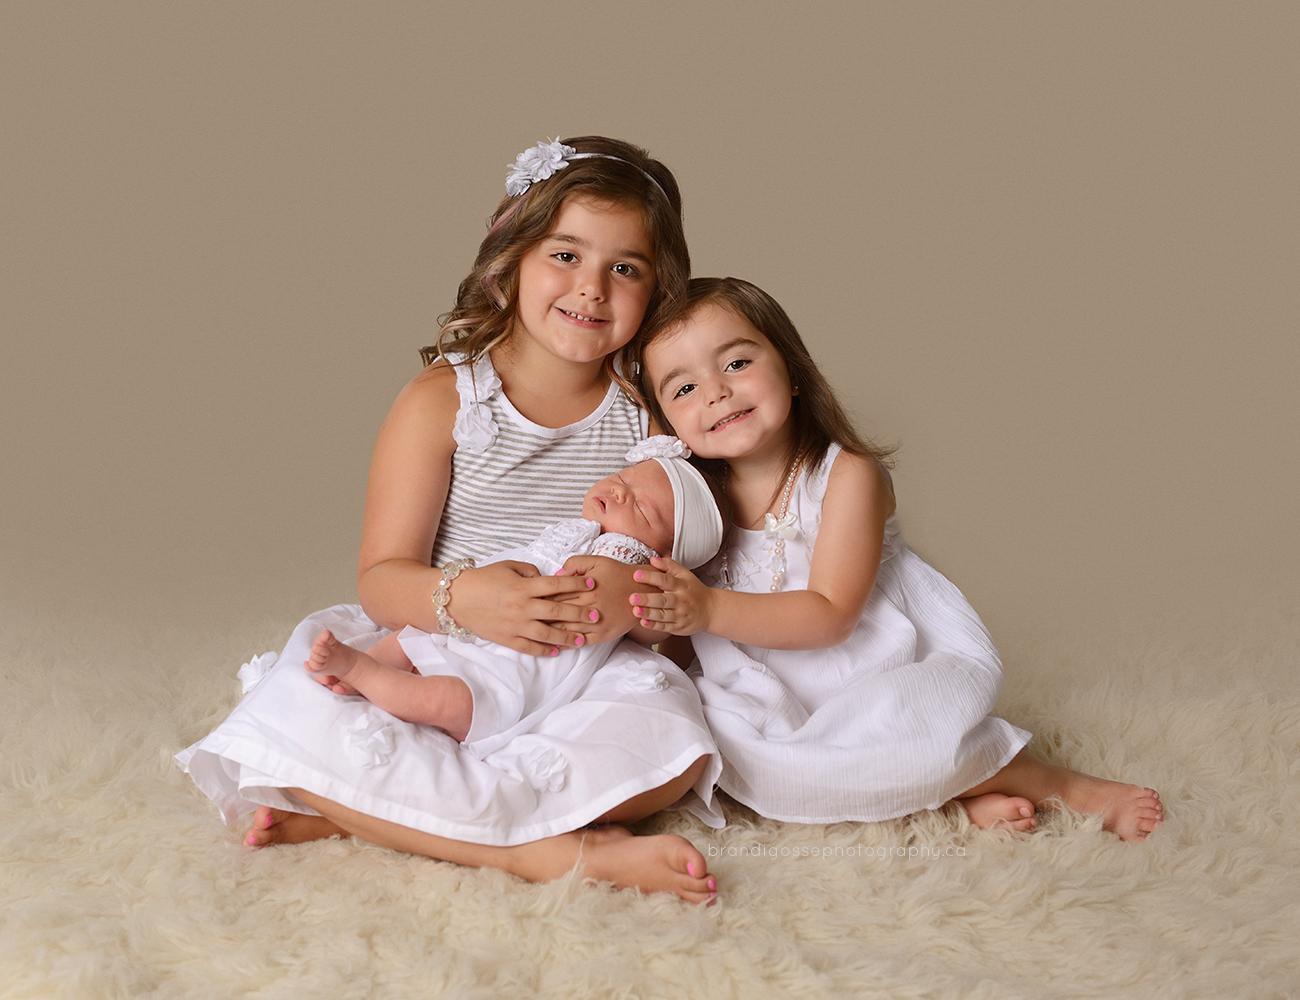 newfoundland baby photographer, newborn photos St. John's